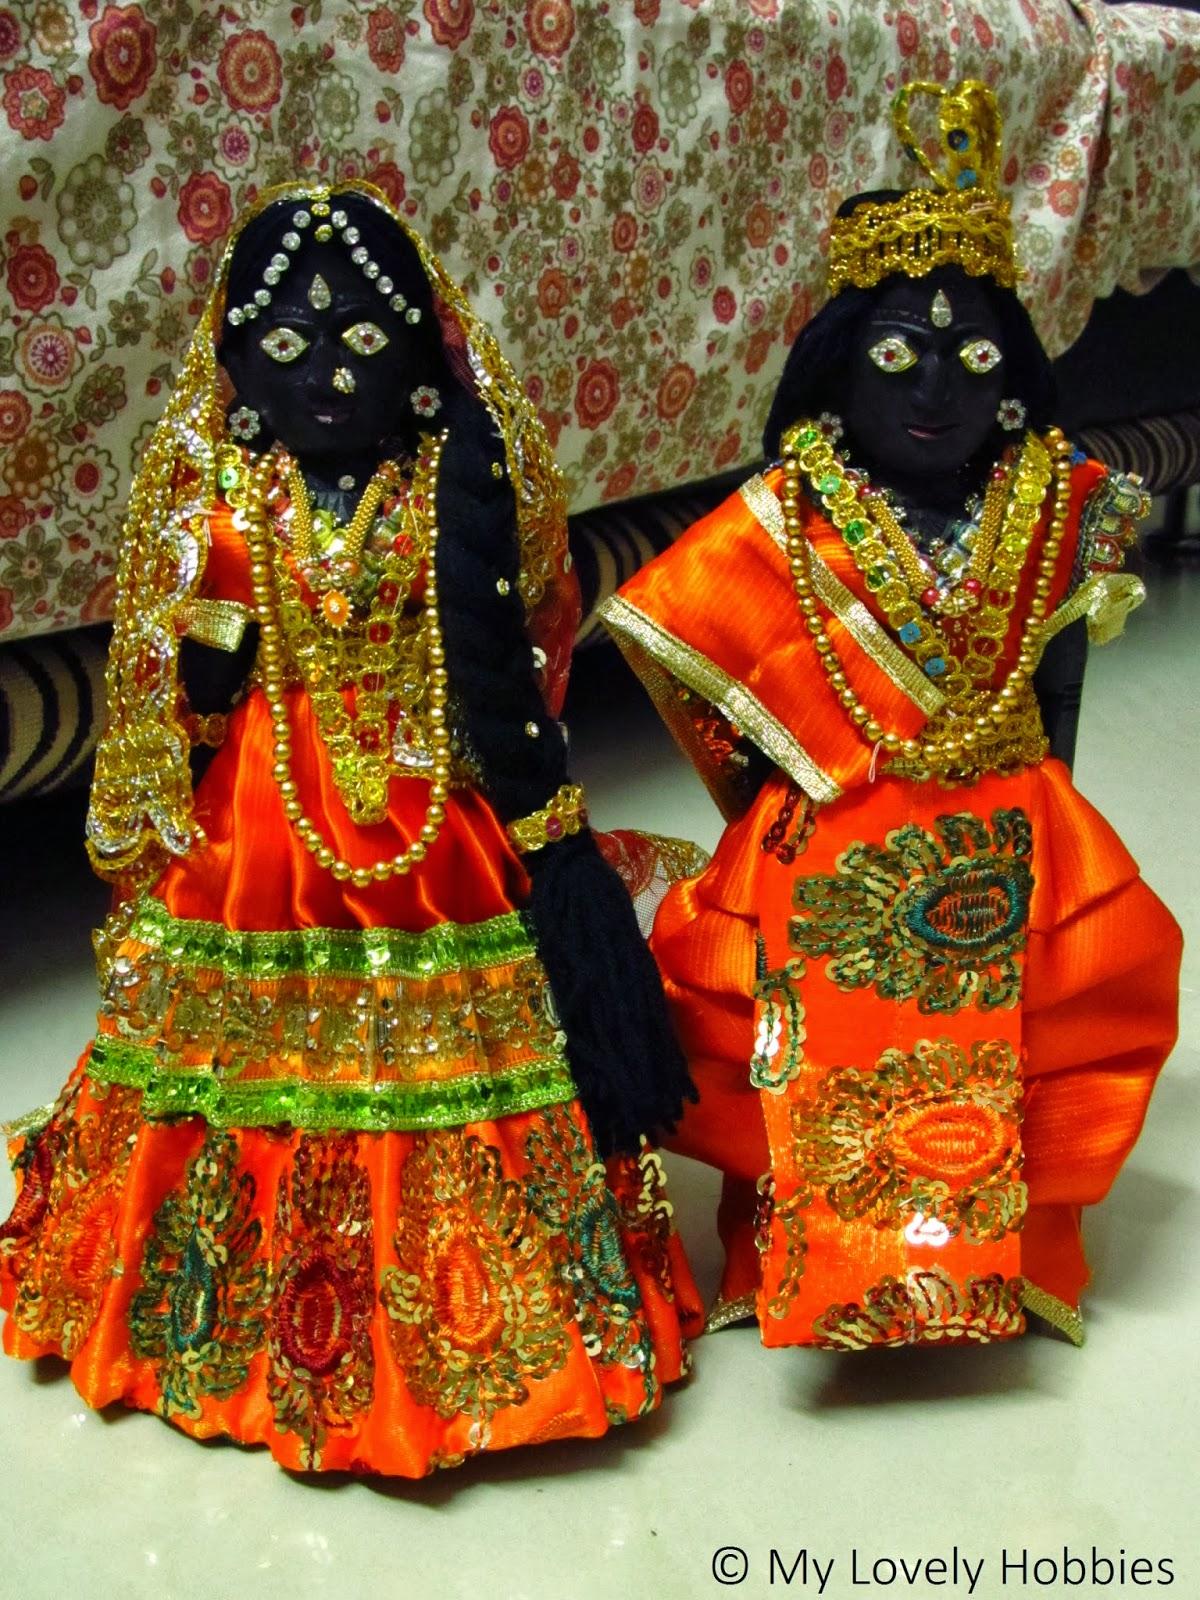 My Lovely Hobbies Marapachi Doll Decoration